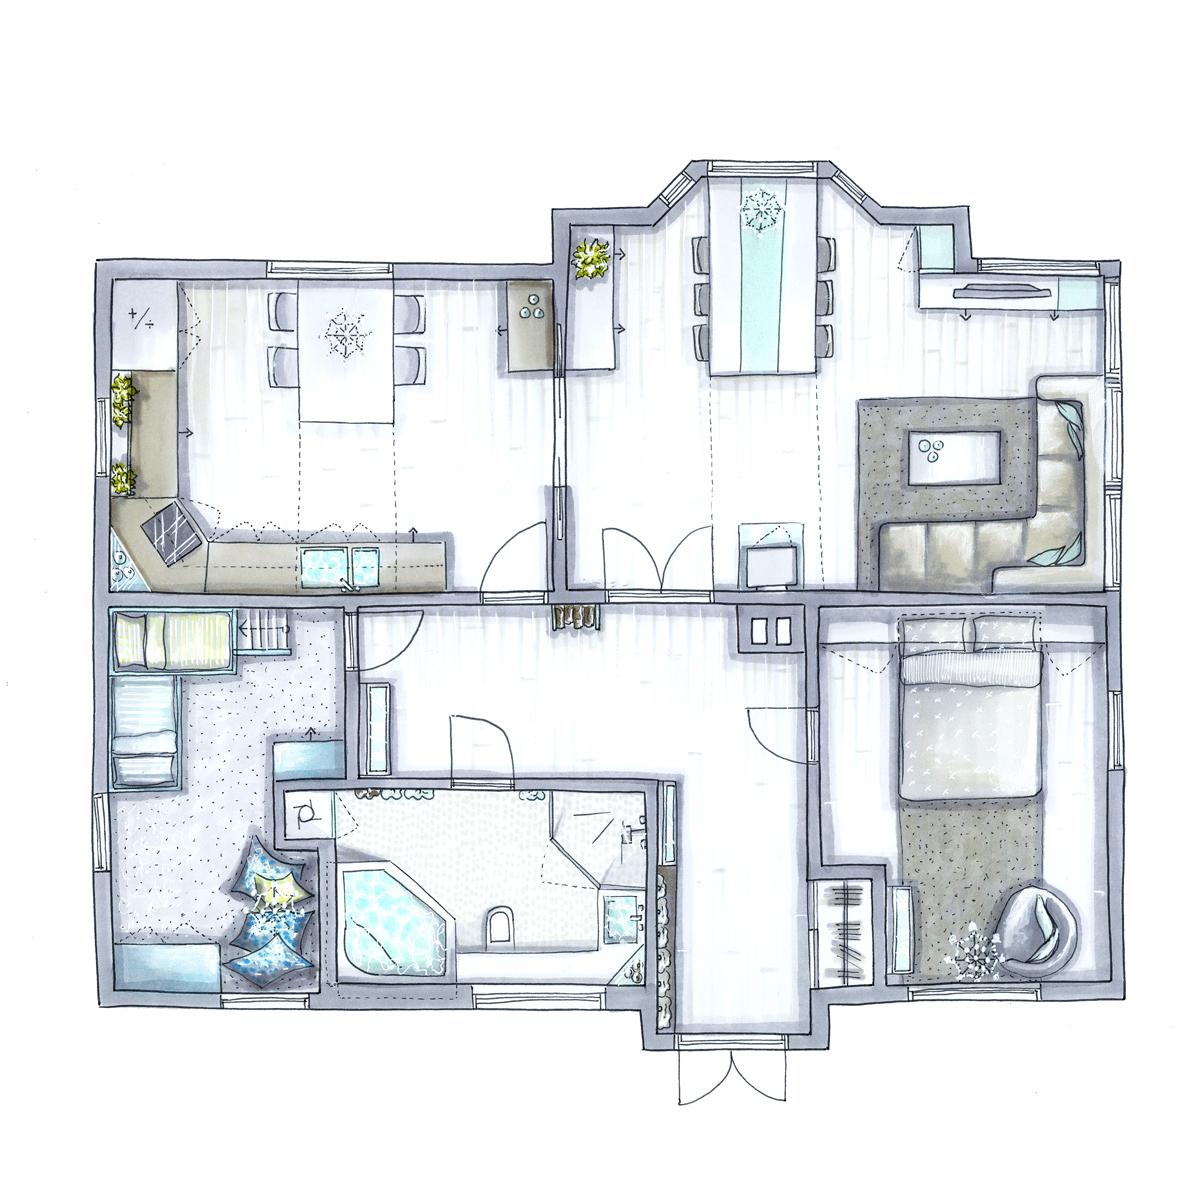 Floorplan_copicmarkers.jpg